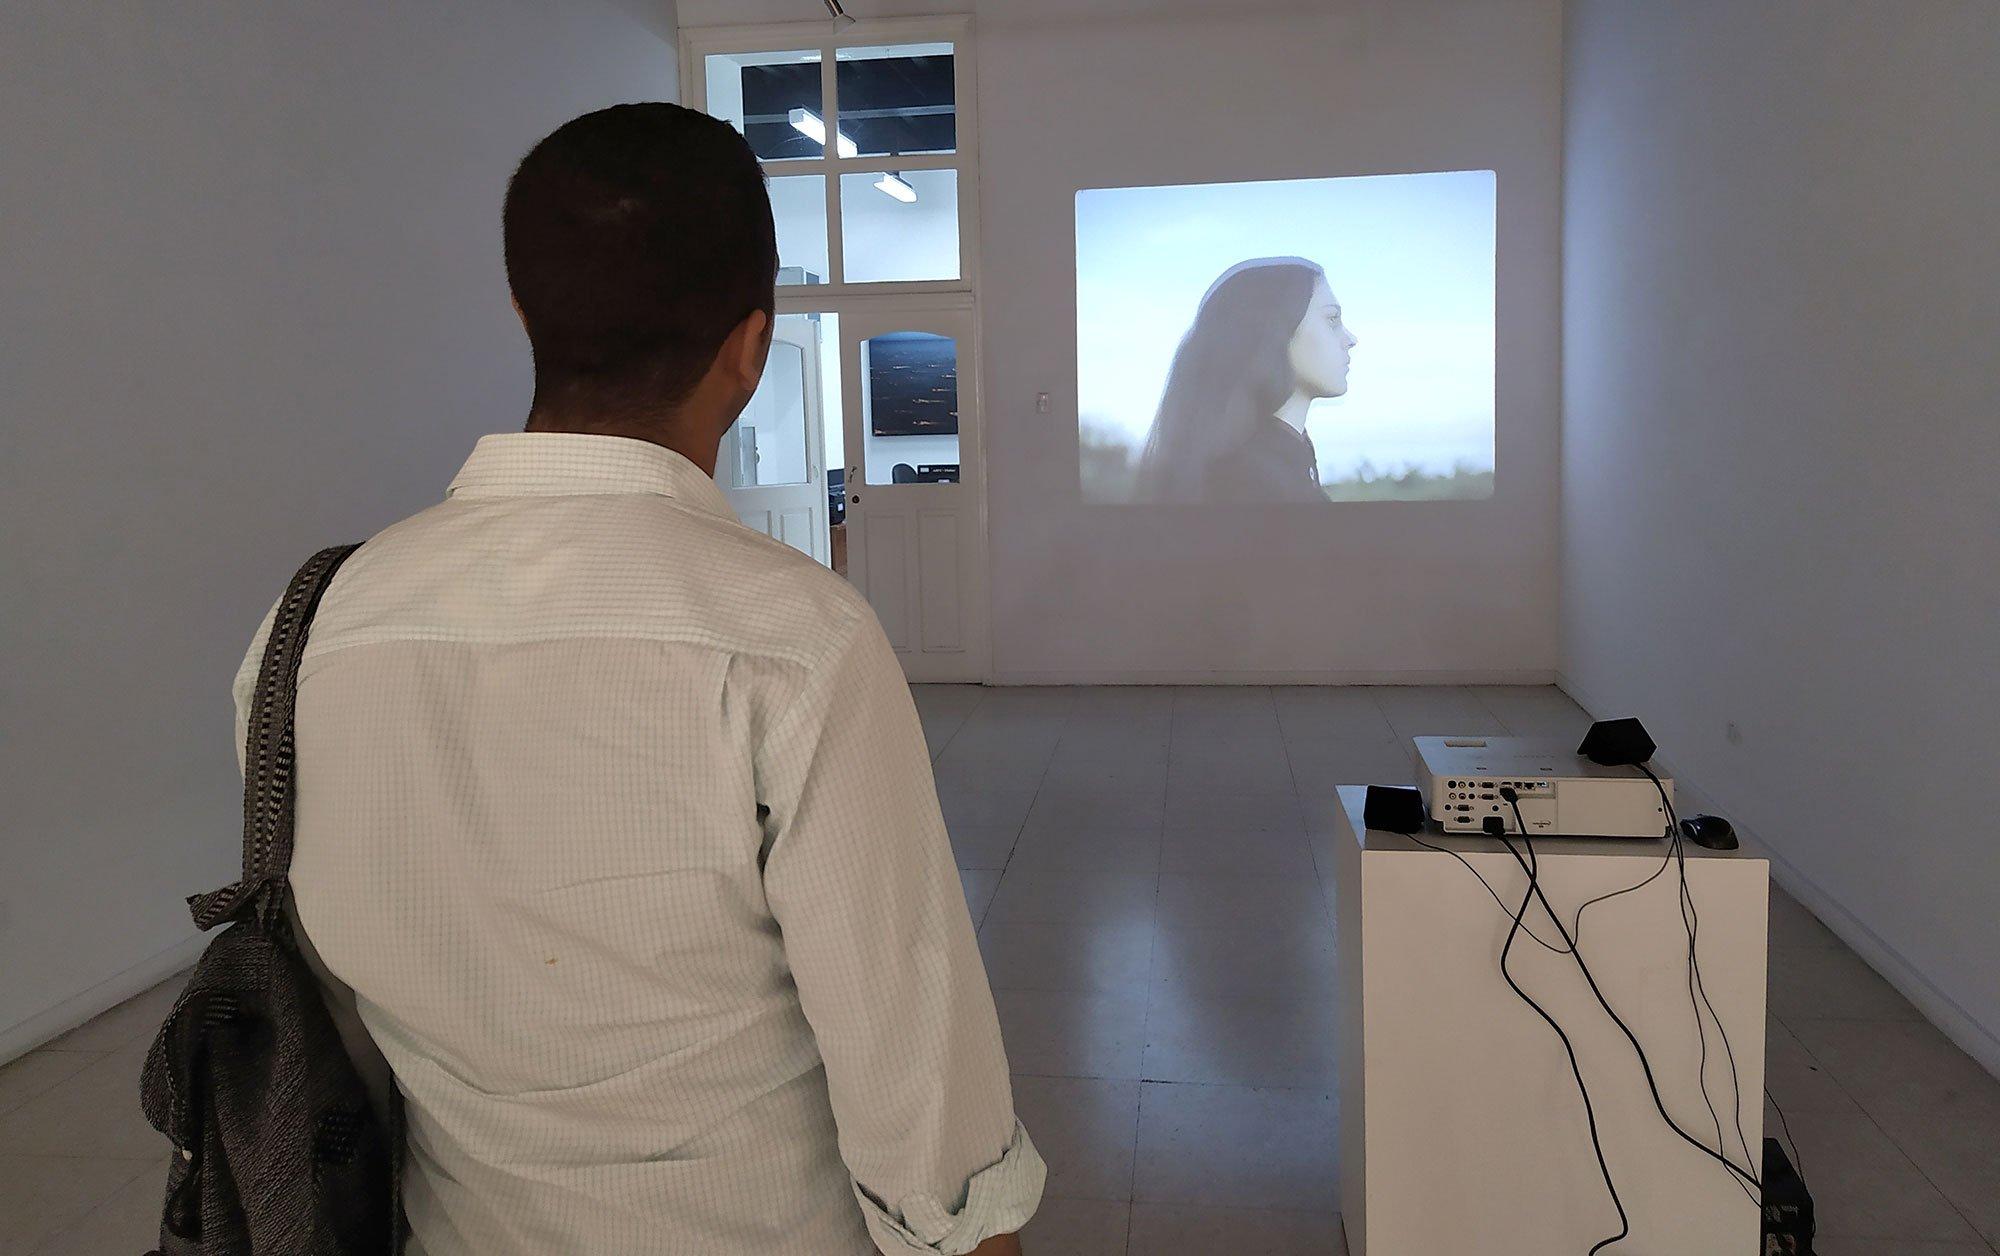 exposición-videoarte-alejandra-glez